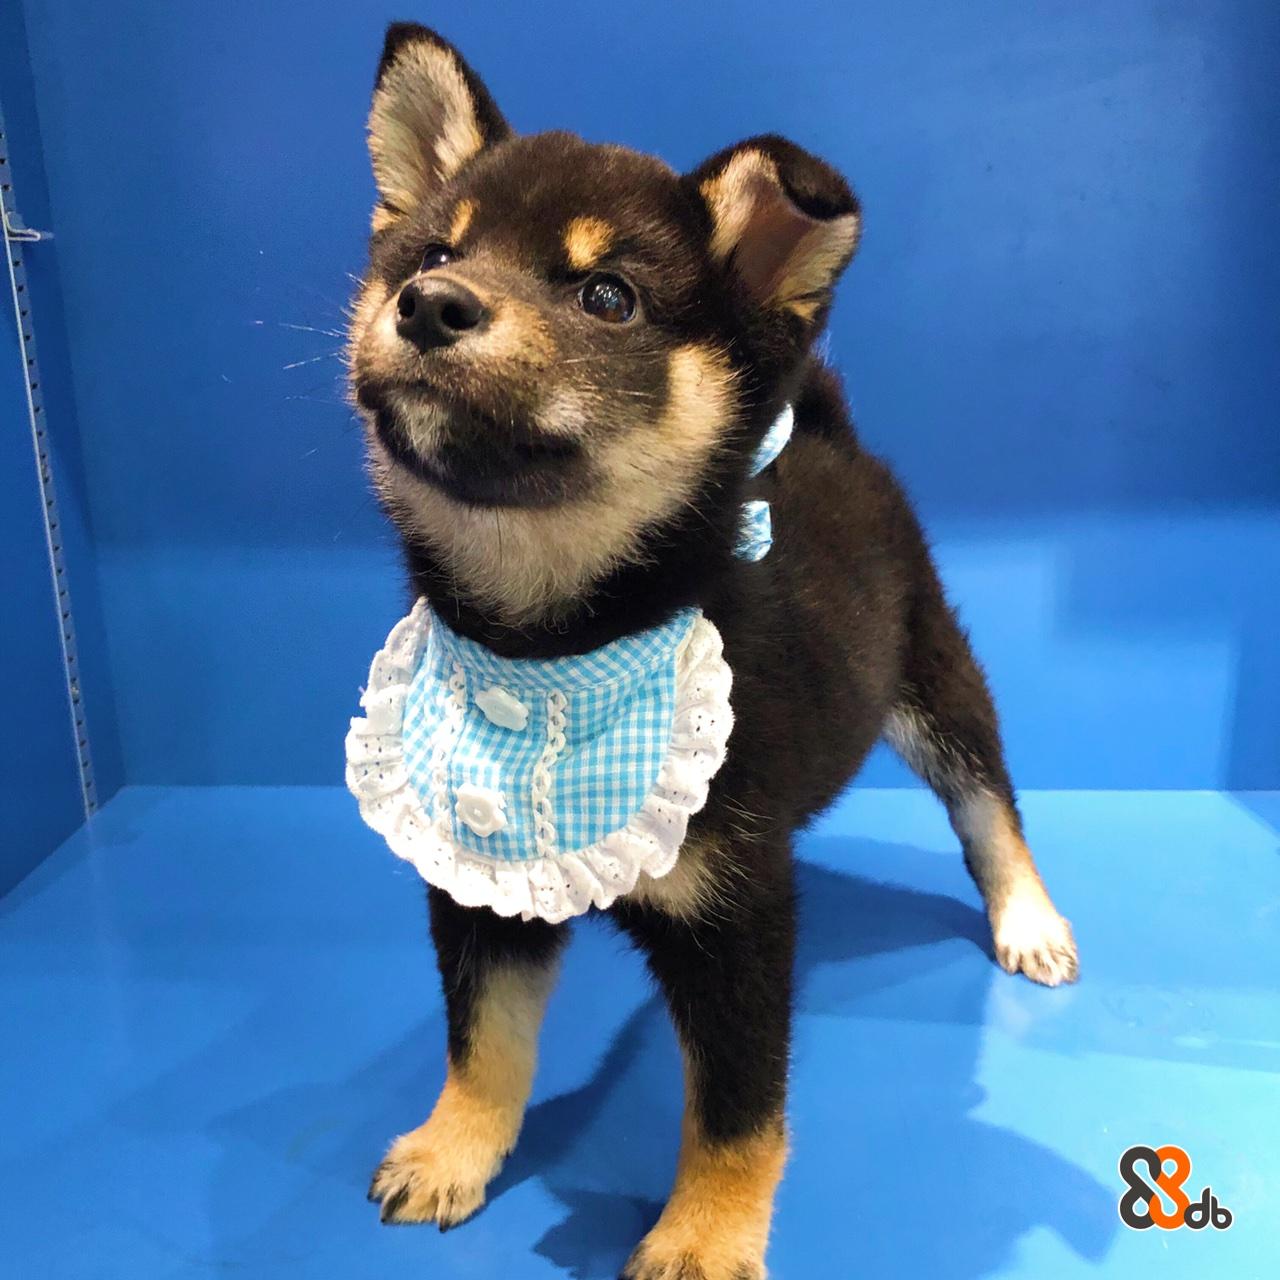 Dog,Mammal,Vertebrate,Dog breed,Canidae